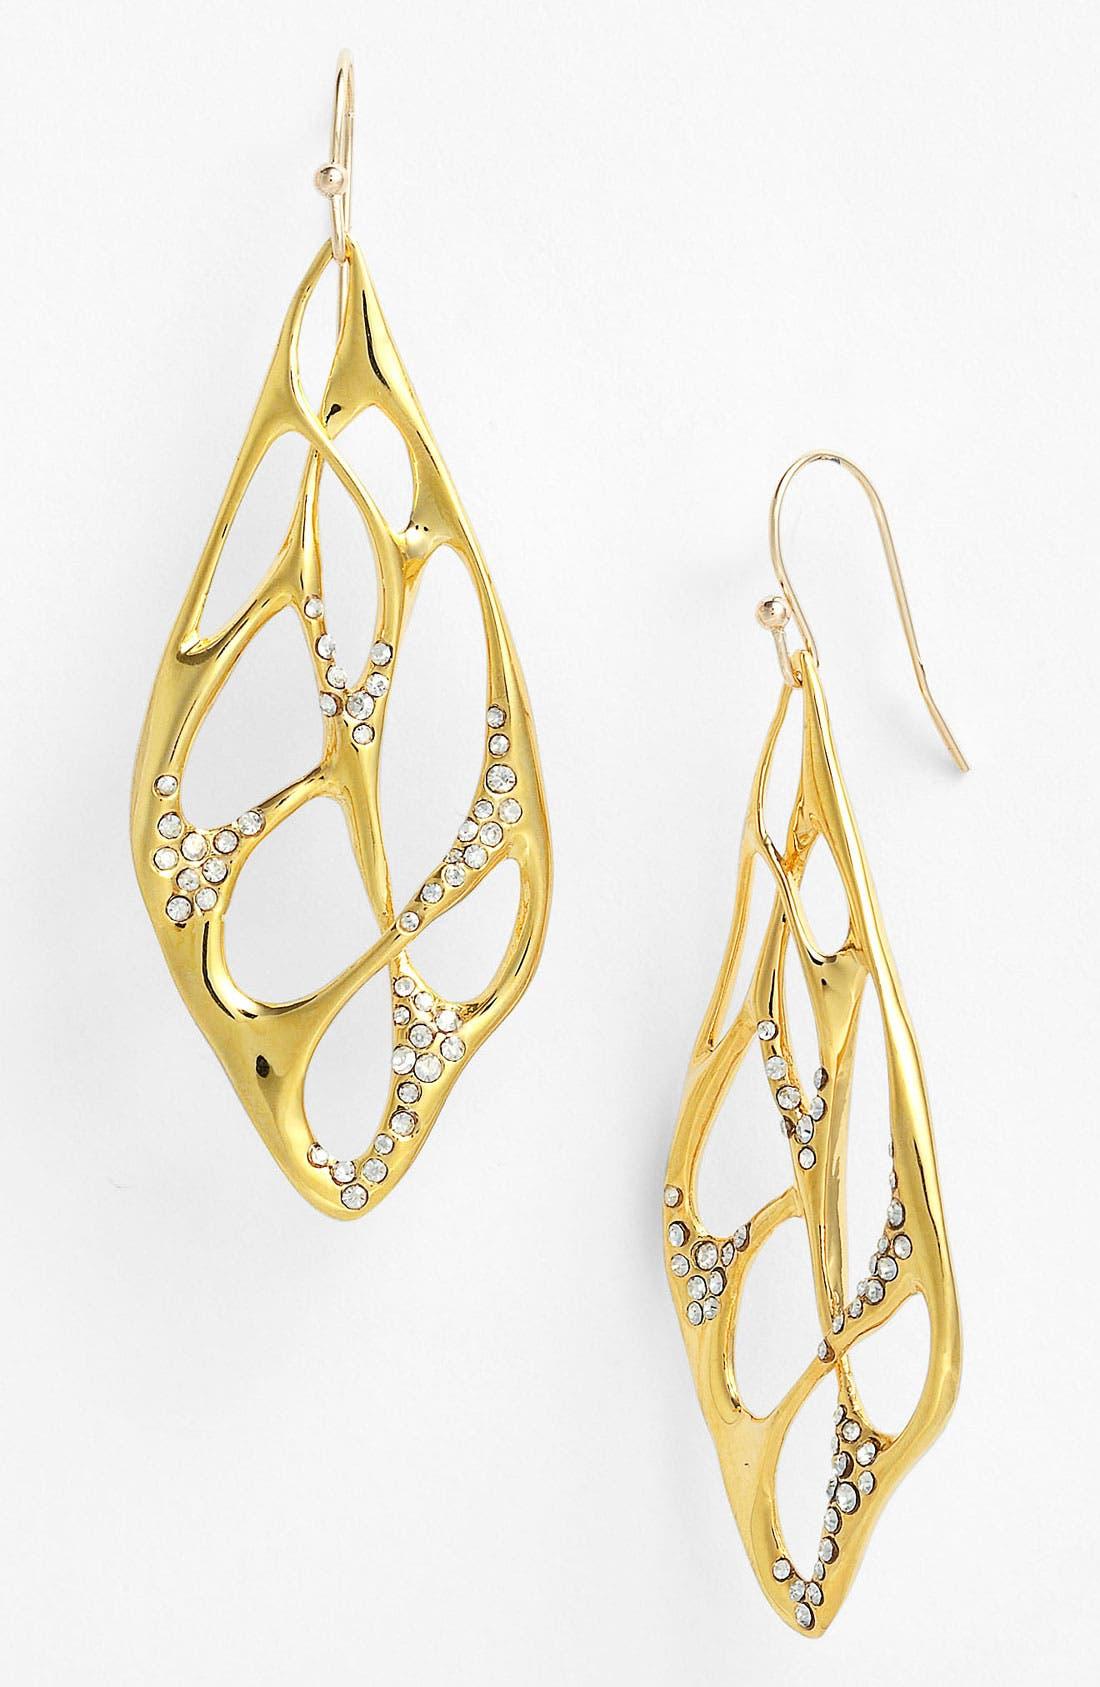 Alternate Image 1 Selected - Alexis Bittar 'Miss Havisham - Liquid Gold' Open Drop Earrings